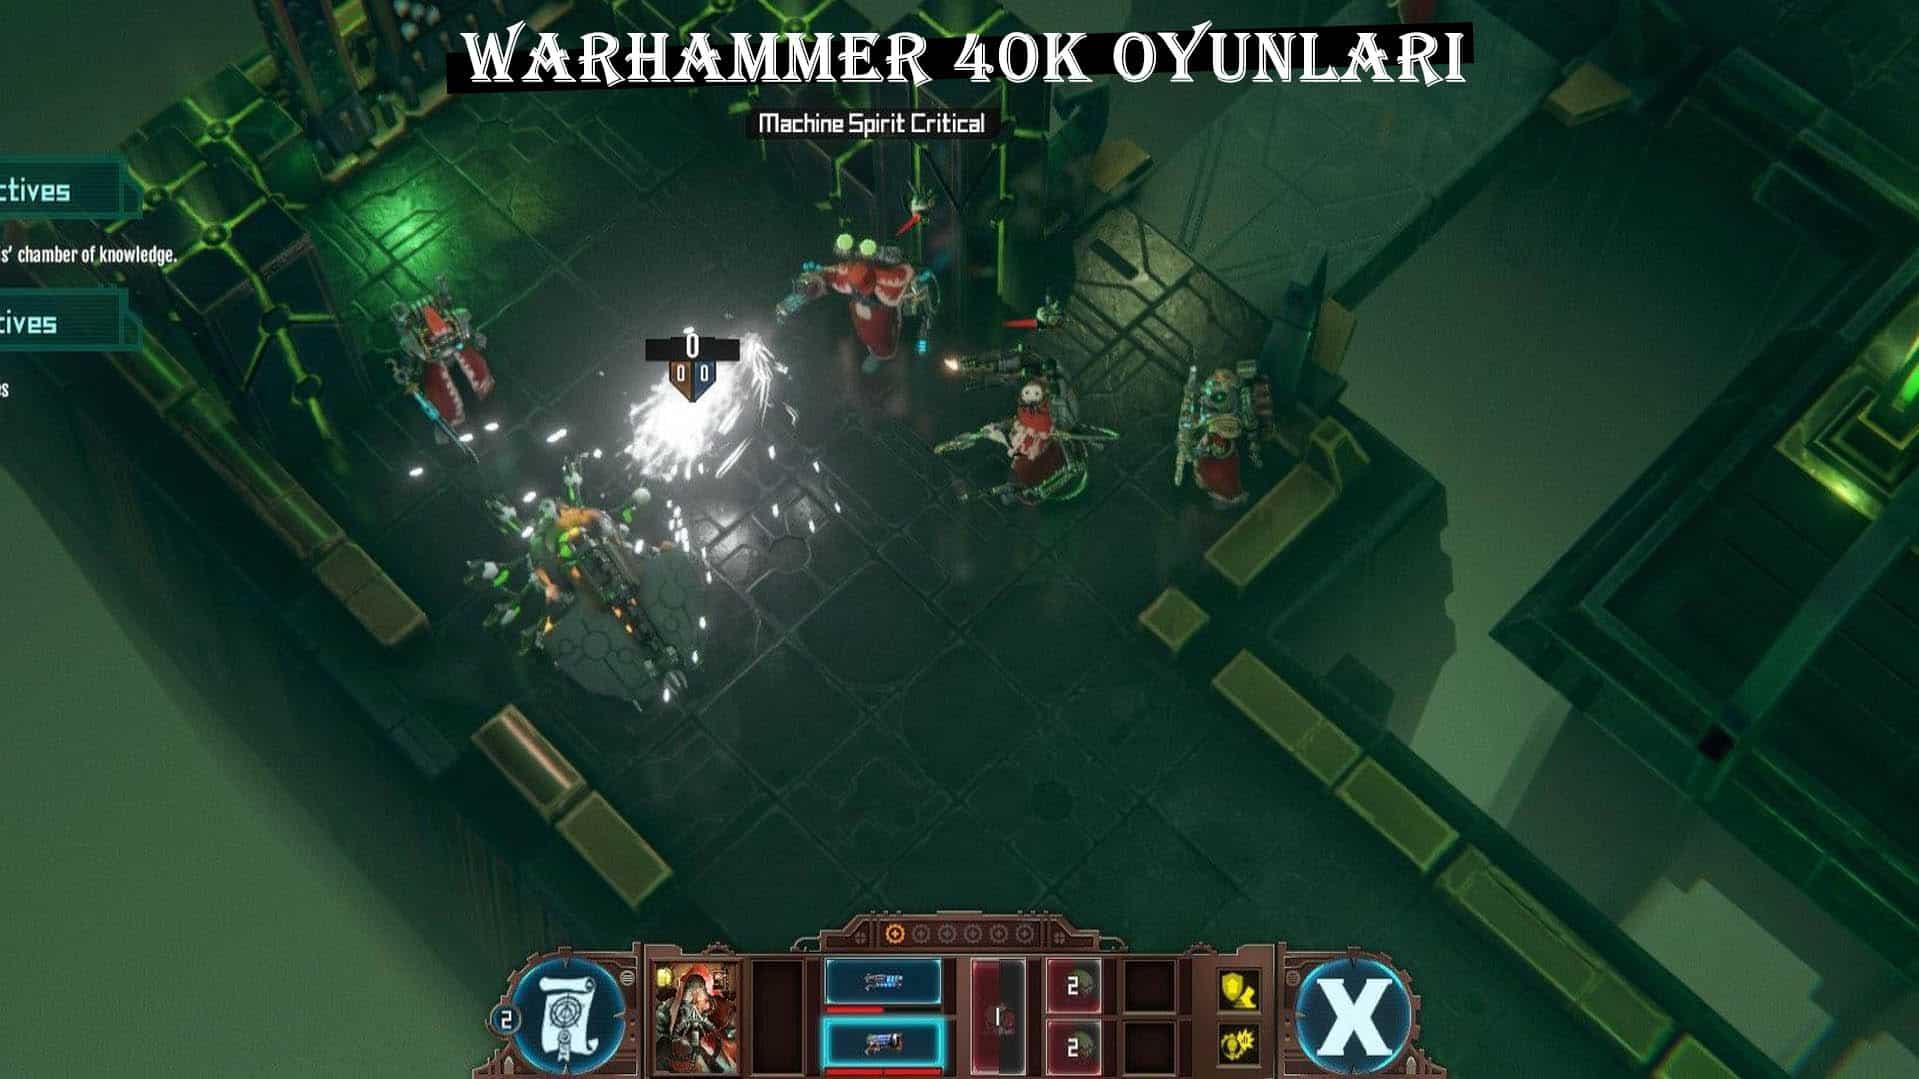 warhammer 40k oyunları